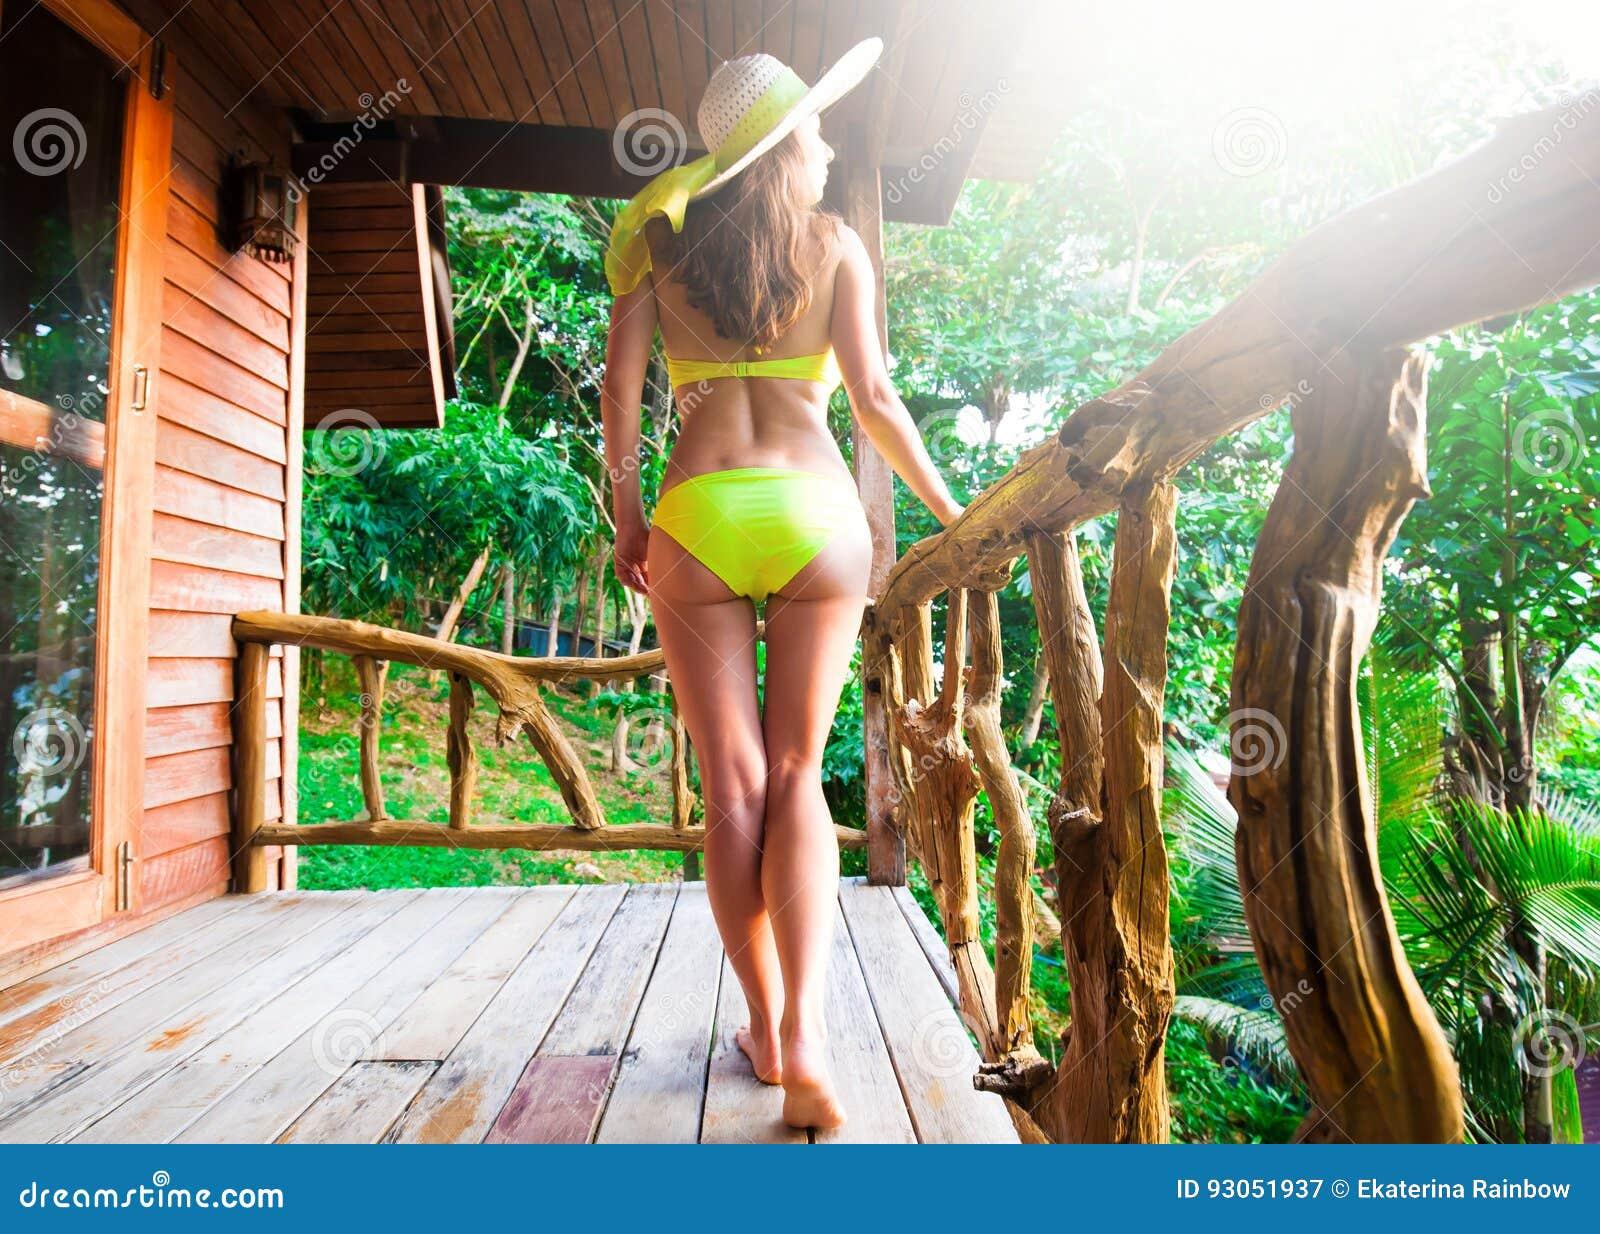 Jardin Image De Arrière Phi Femme Thailand Stock Bikini q8TUanTS